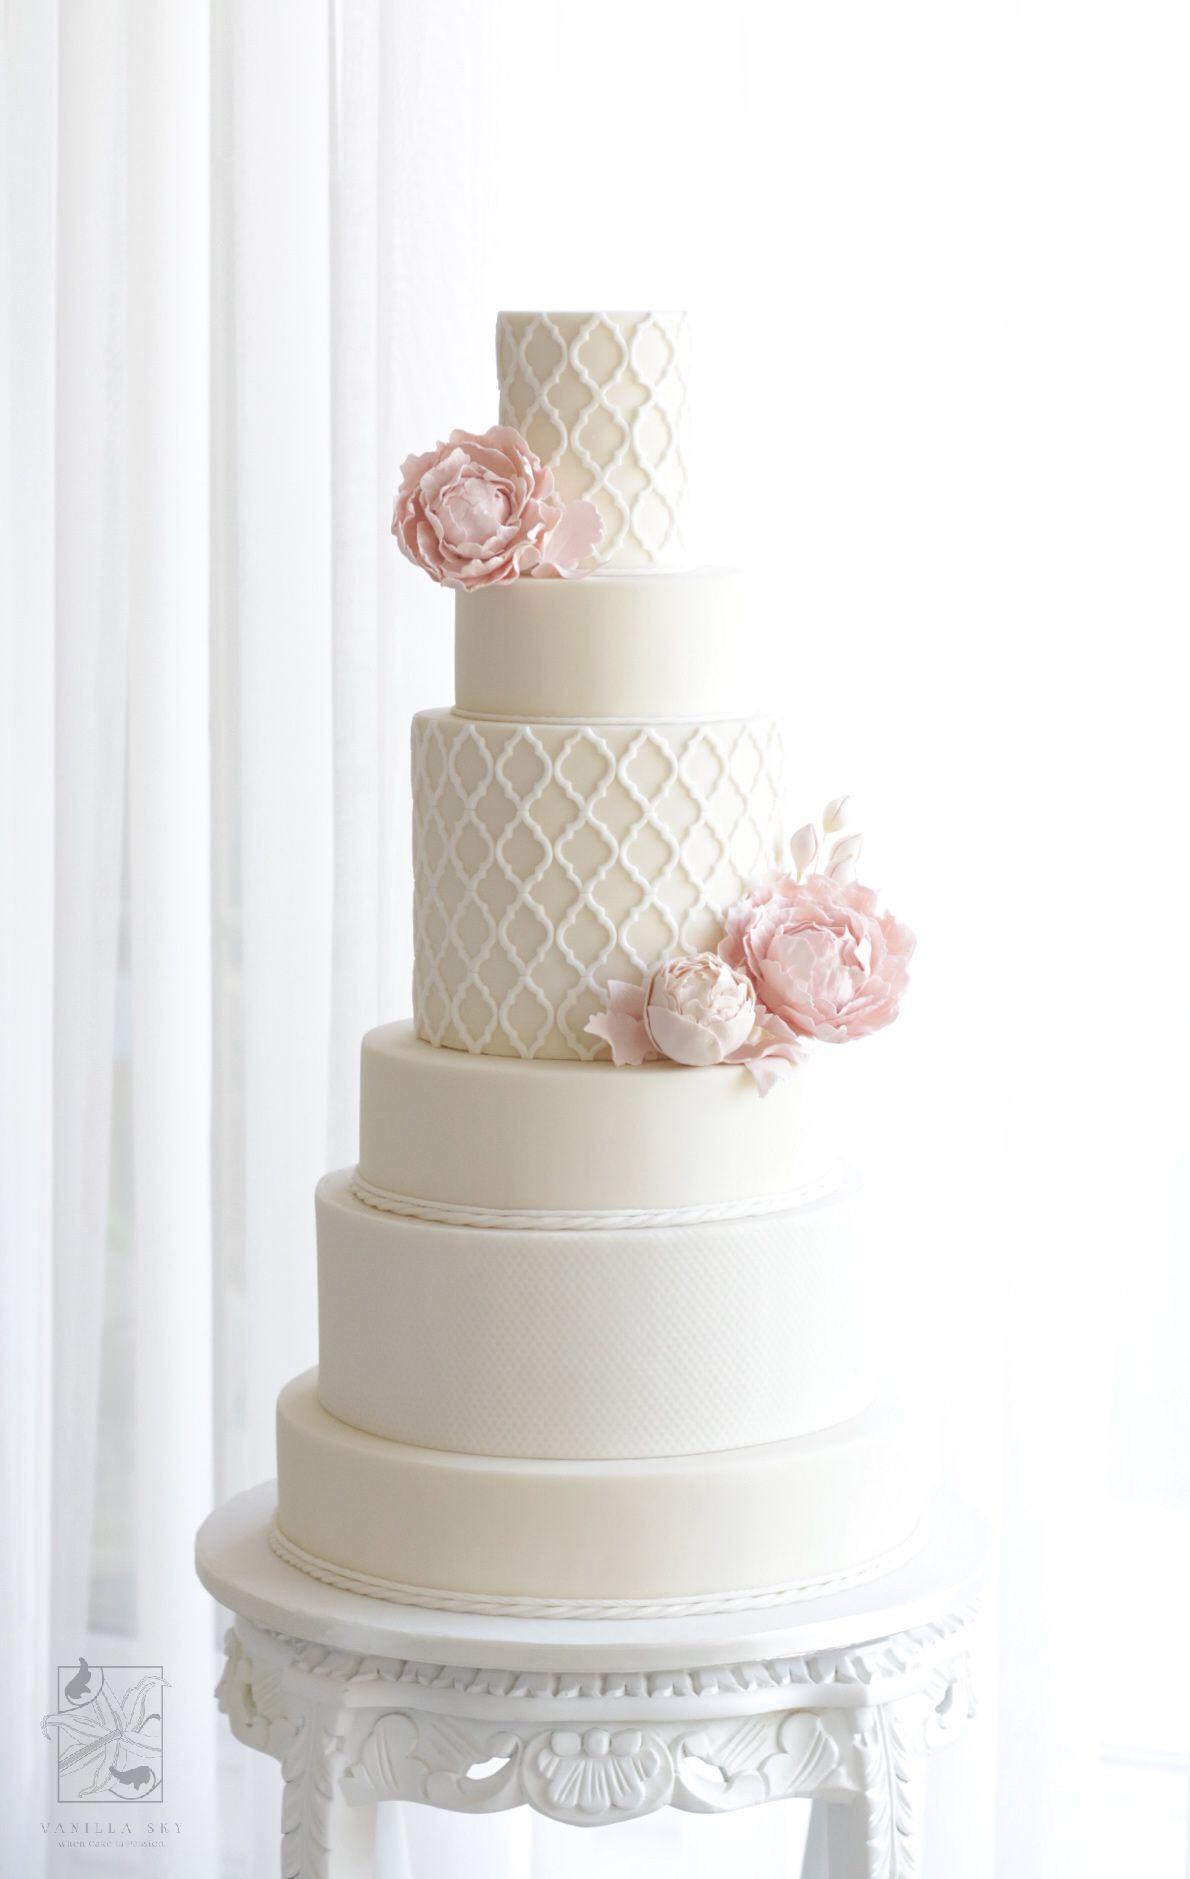 Ivory wedding cake with light pink sugar roses